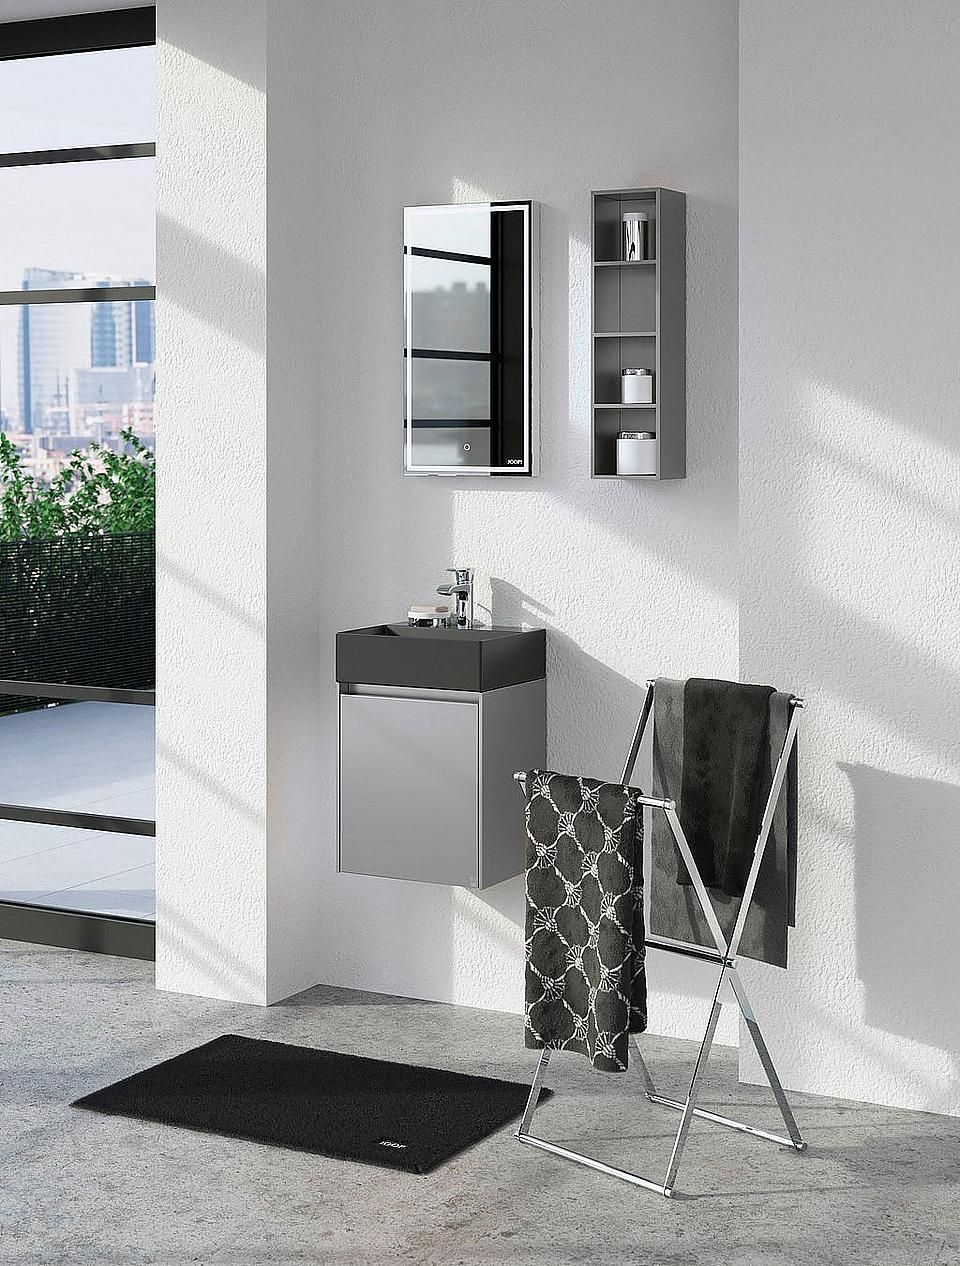 Joop Living Regal J Bath Badgestaltung Badezimmer Regal